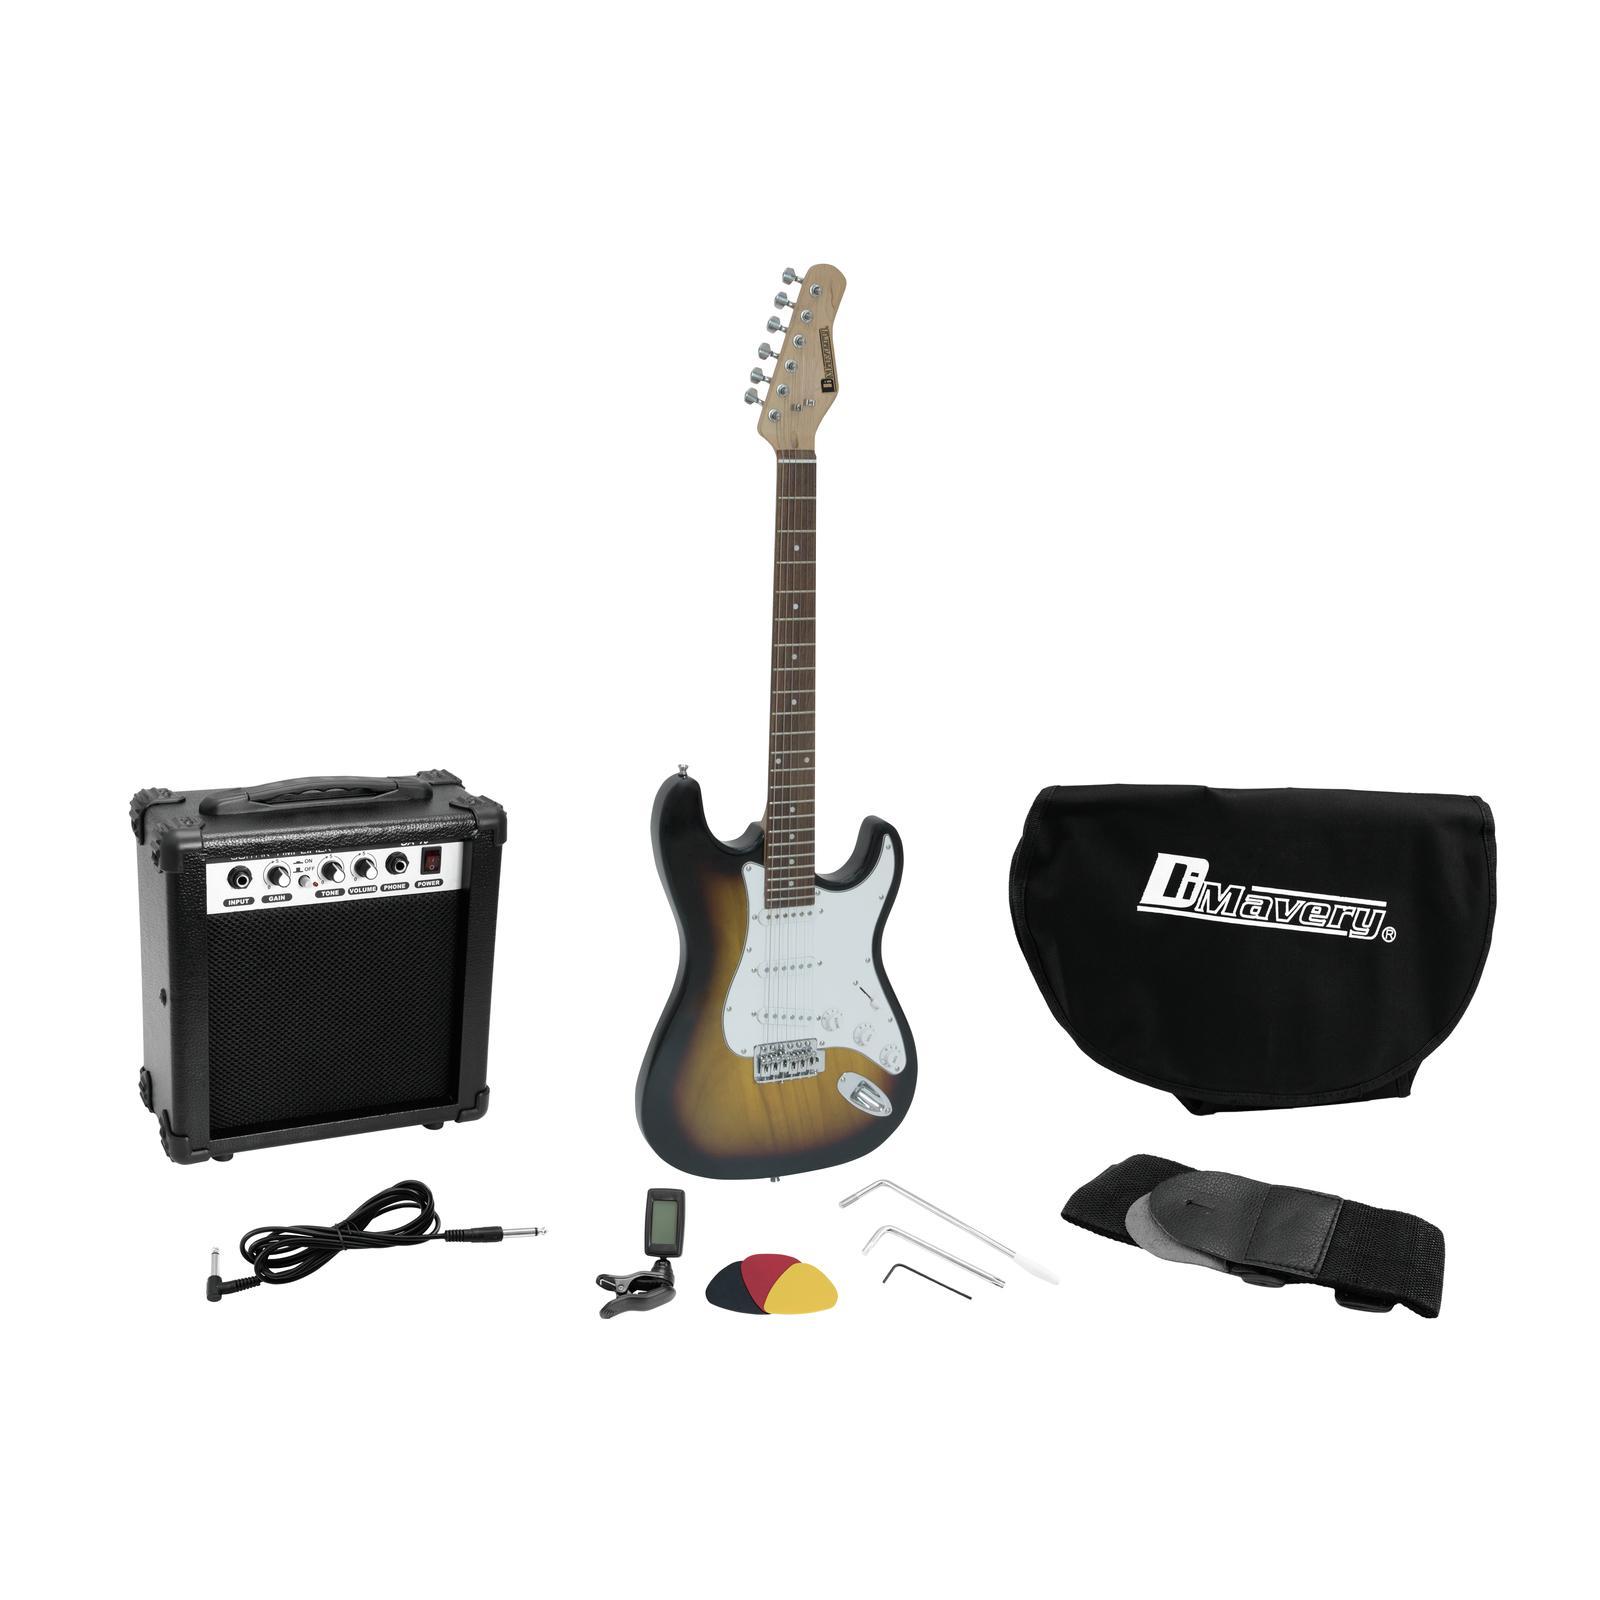 dimavery egs 1 electric guitar set sunburst su ingrosso audio e luci salerno. Black Bedroom Furniture Sets. Home Design Ideas